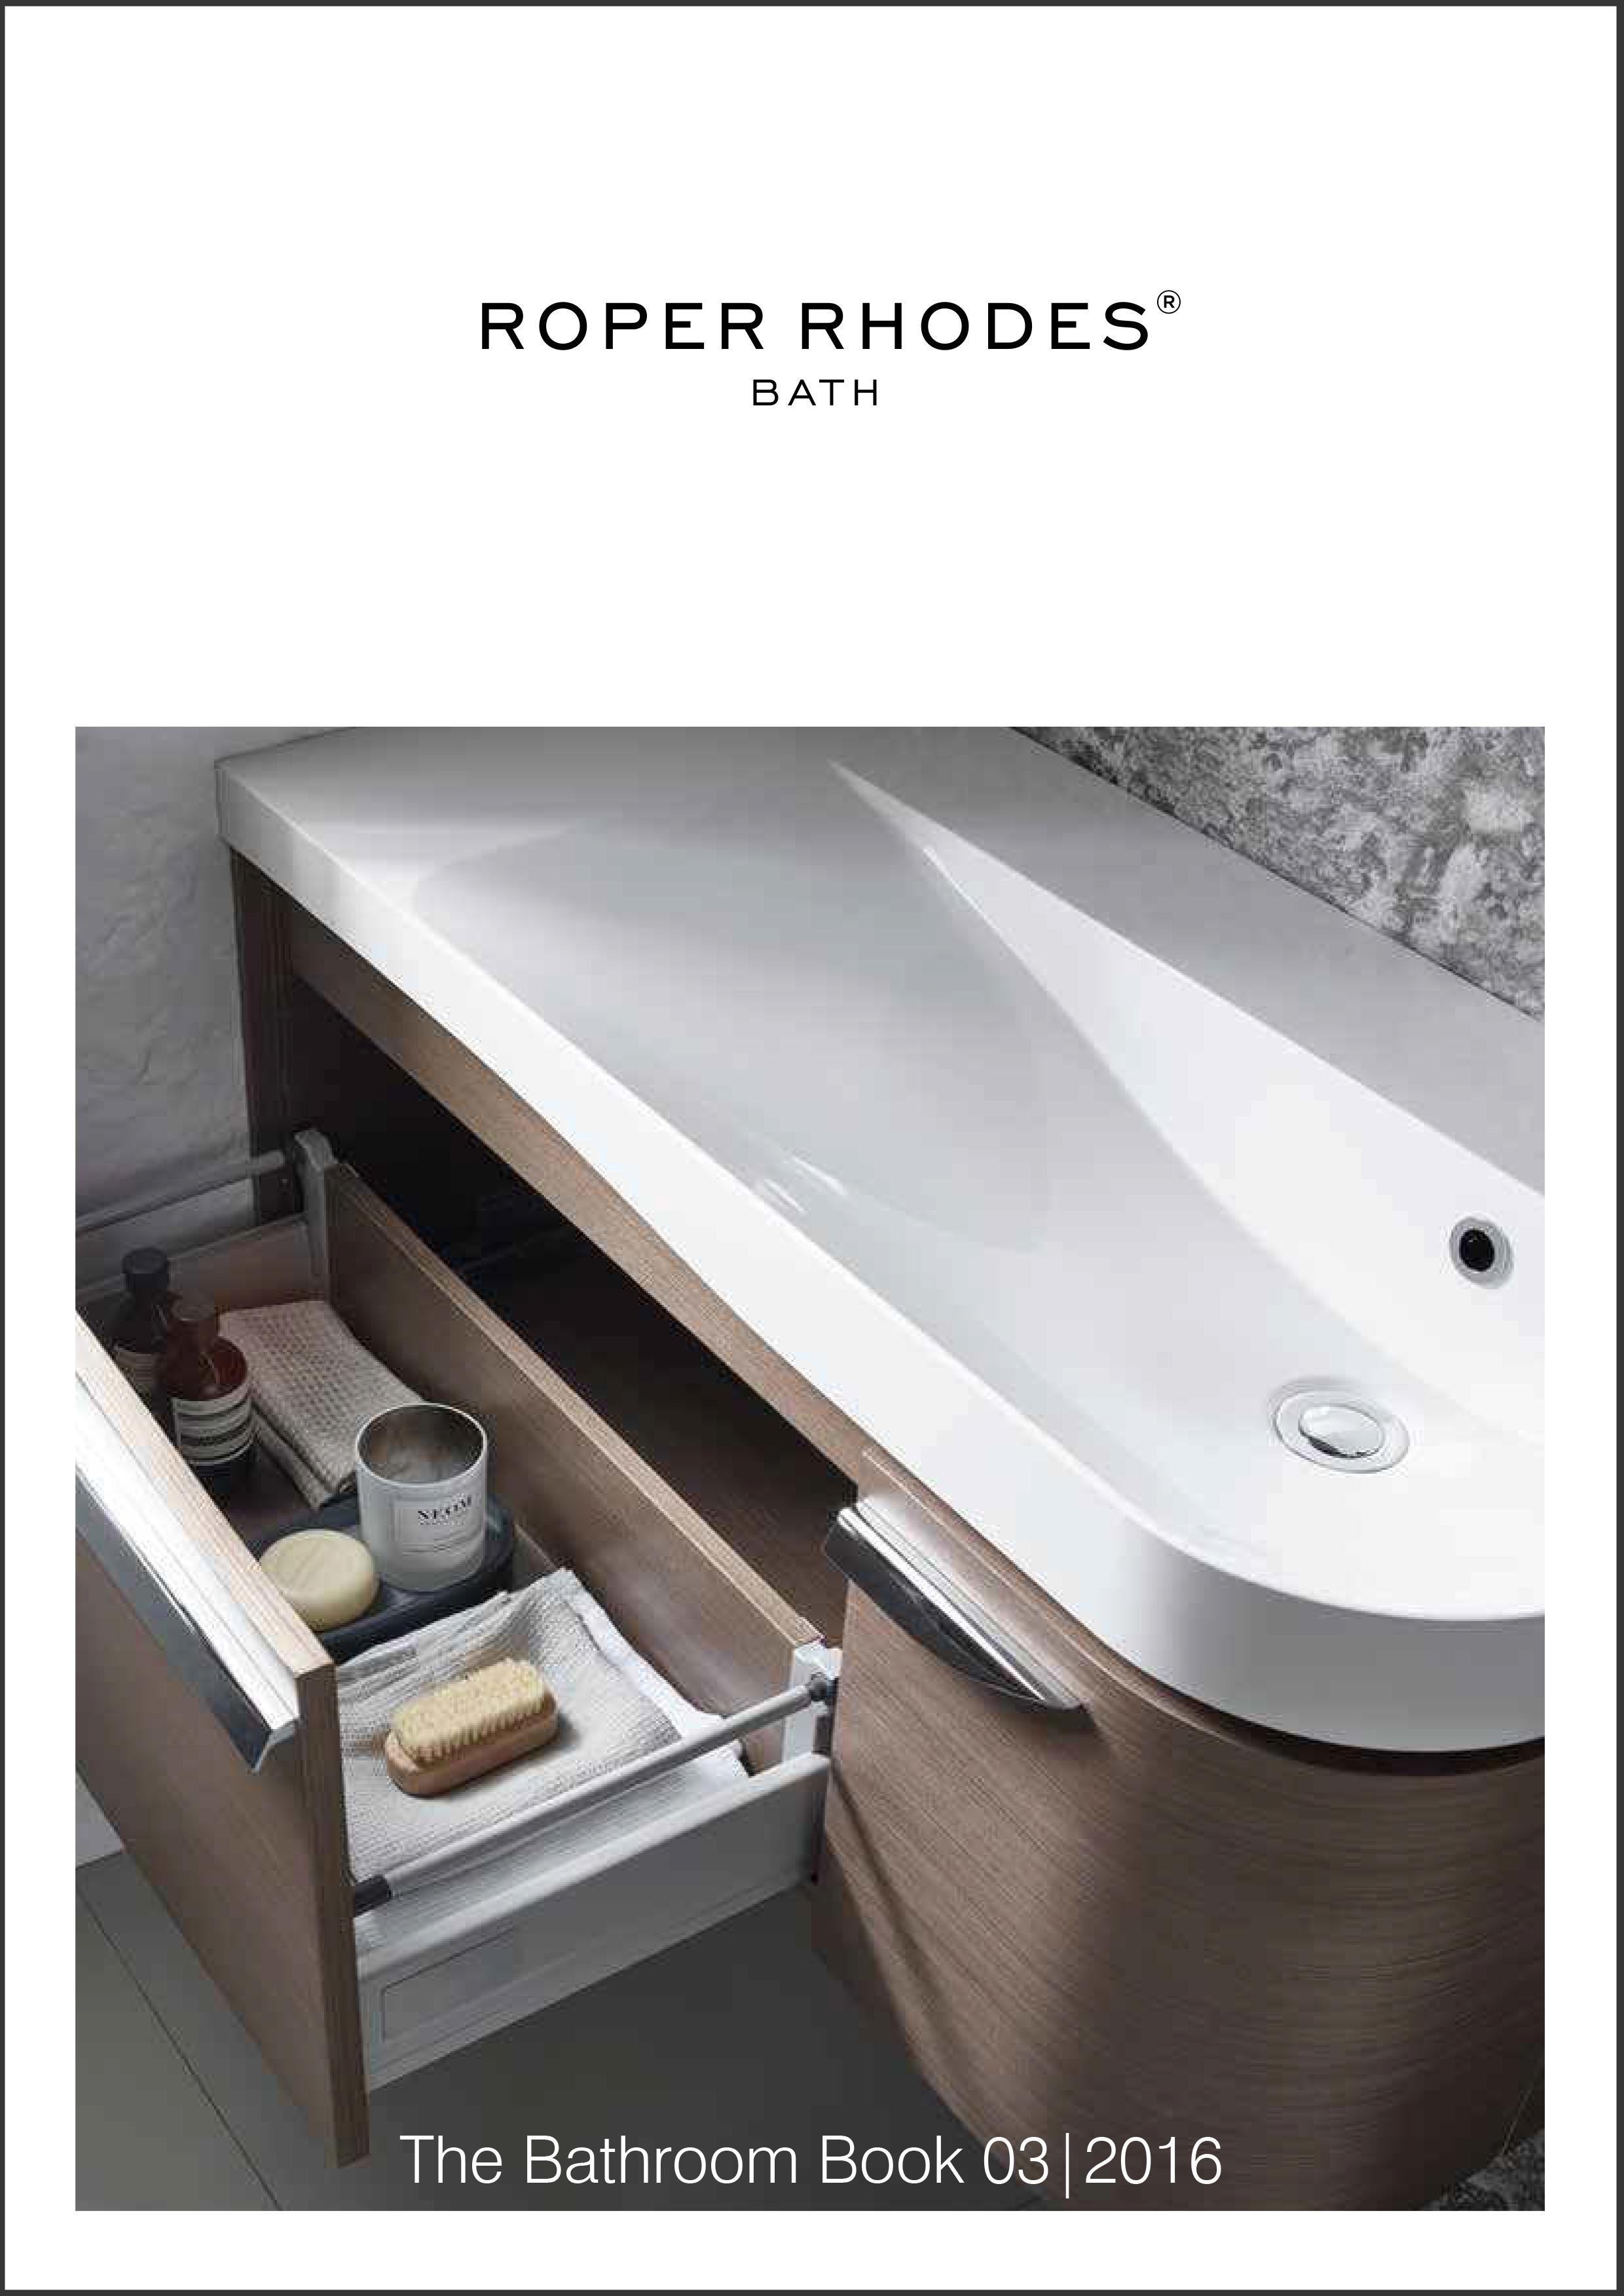 ROPER RHODES 2016 BATHROOM COLLECTION